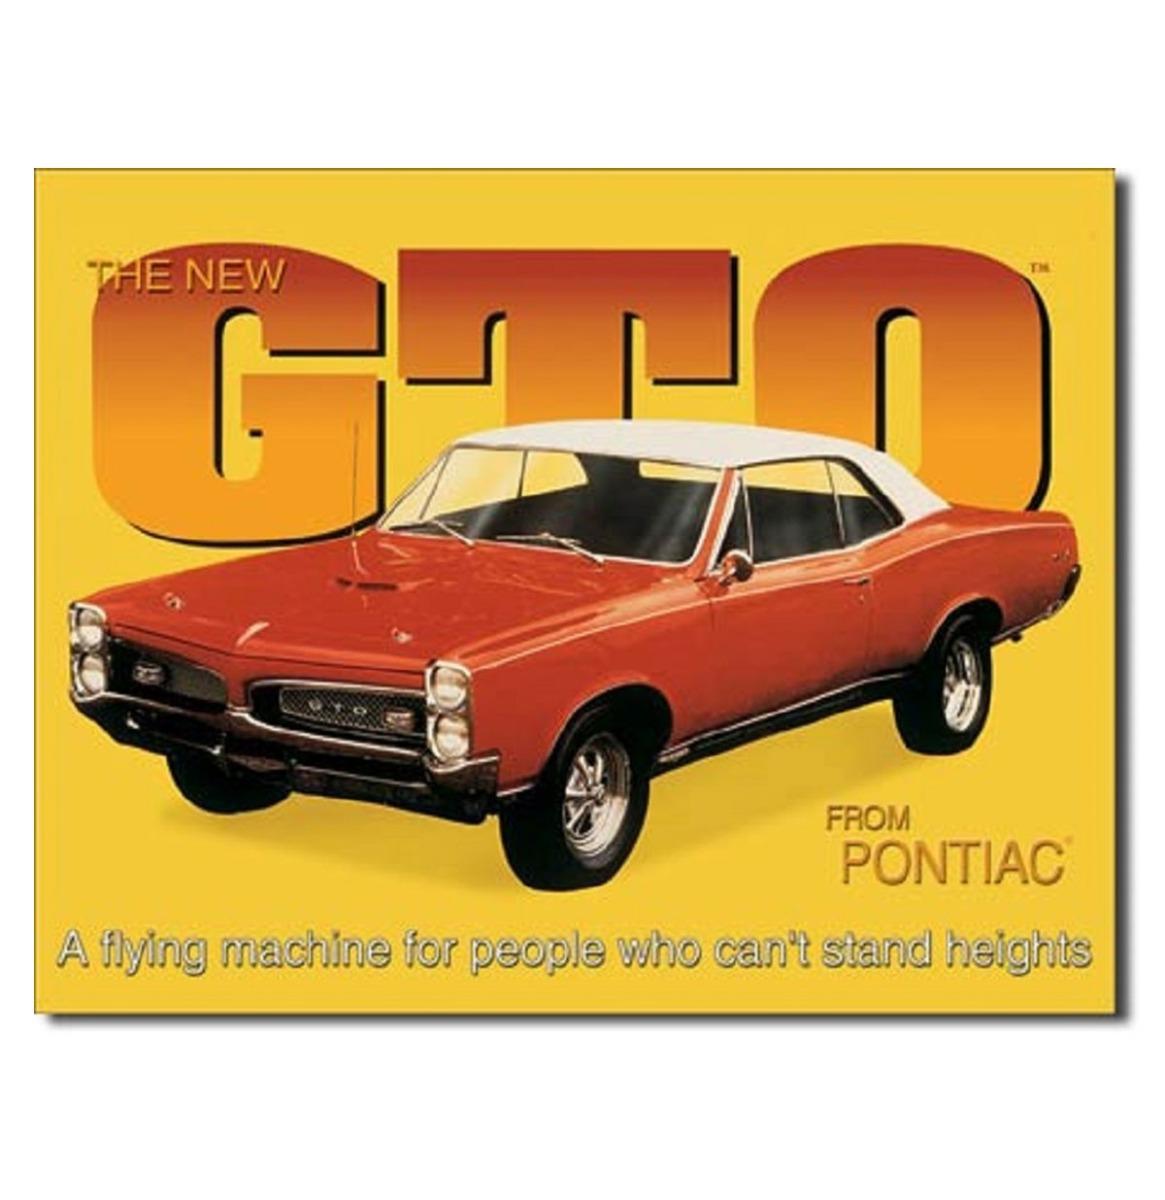 Metalen Bord The New GTO From Pontiac 40,5 x 32 cm